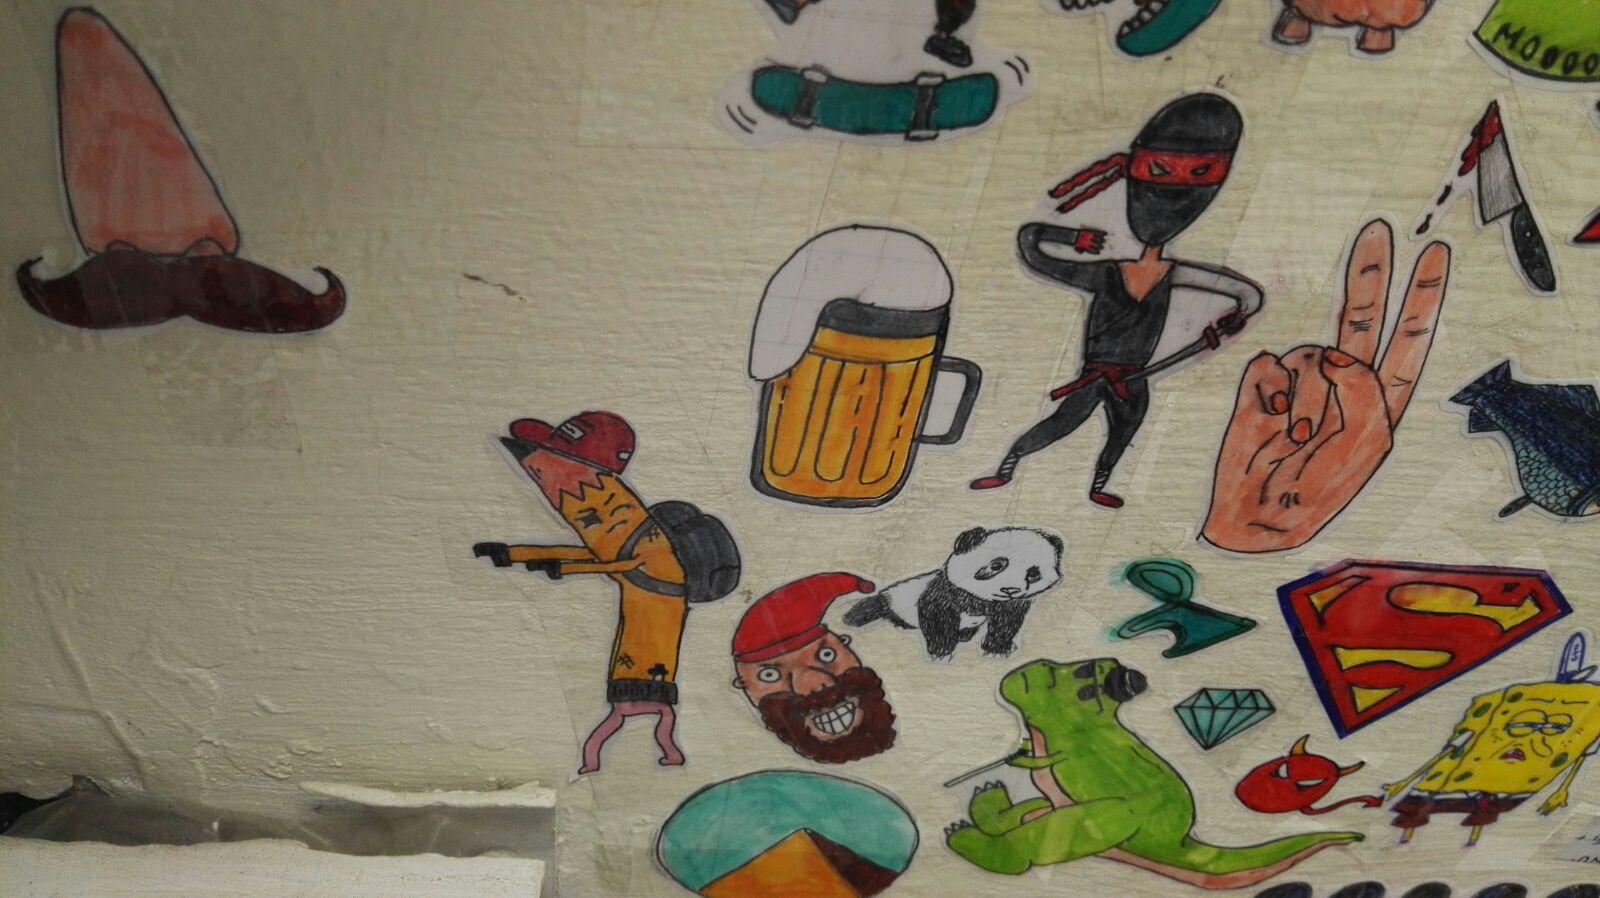 Artwork from the book - מרחבי הספה והספא – תמחקי הודעות, לא את עצמך: & המשוררת by Yoged - יגודז